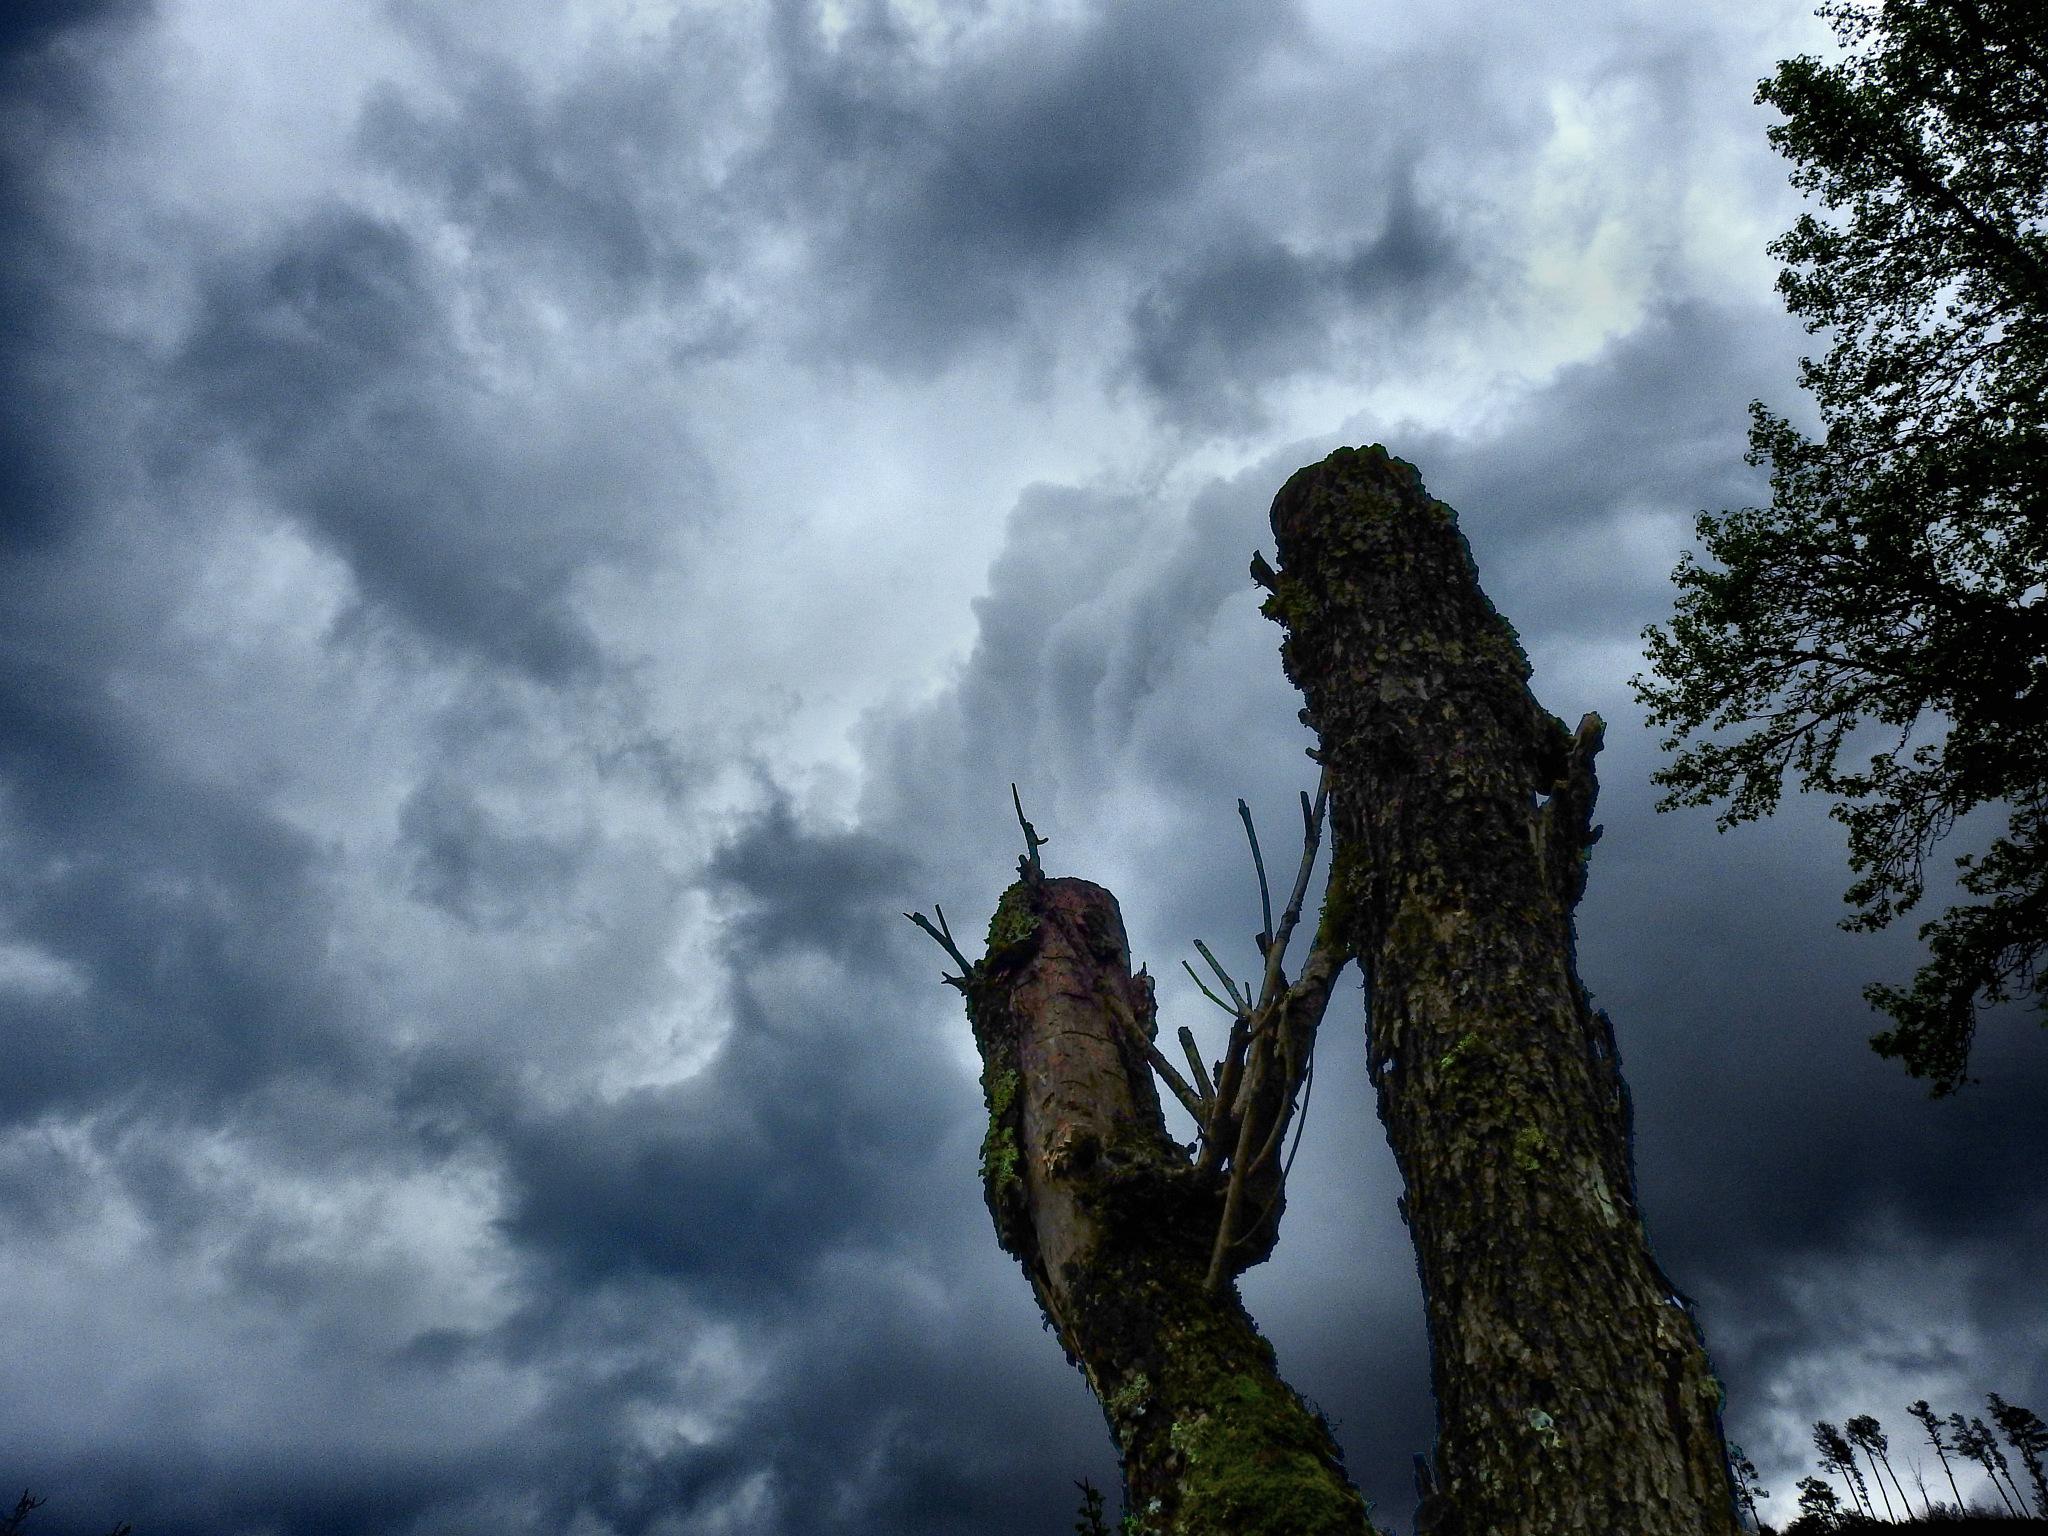 Haunted Skies by Patty Stockton